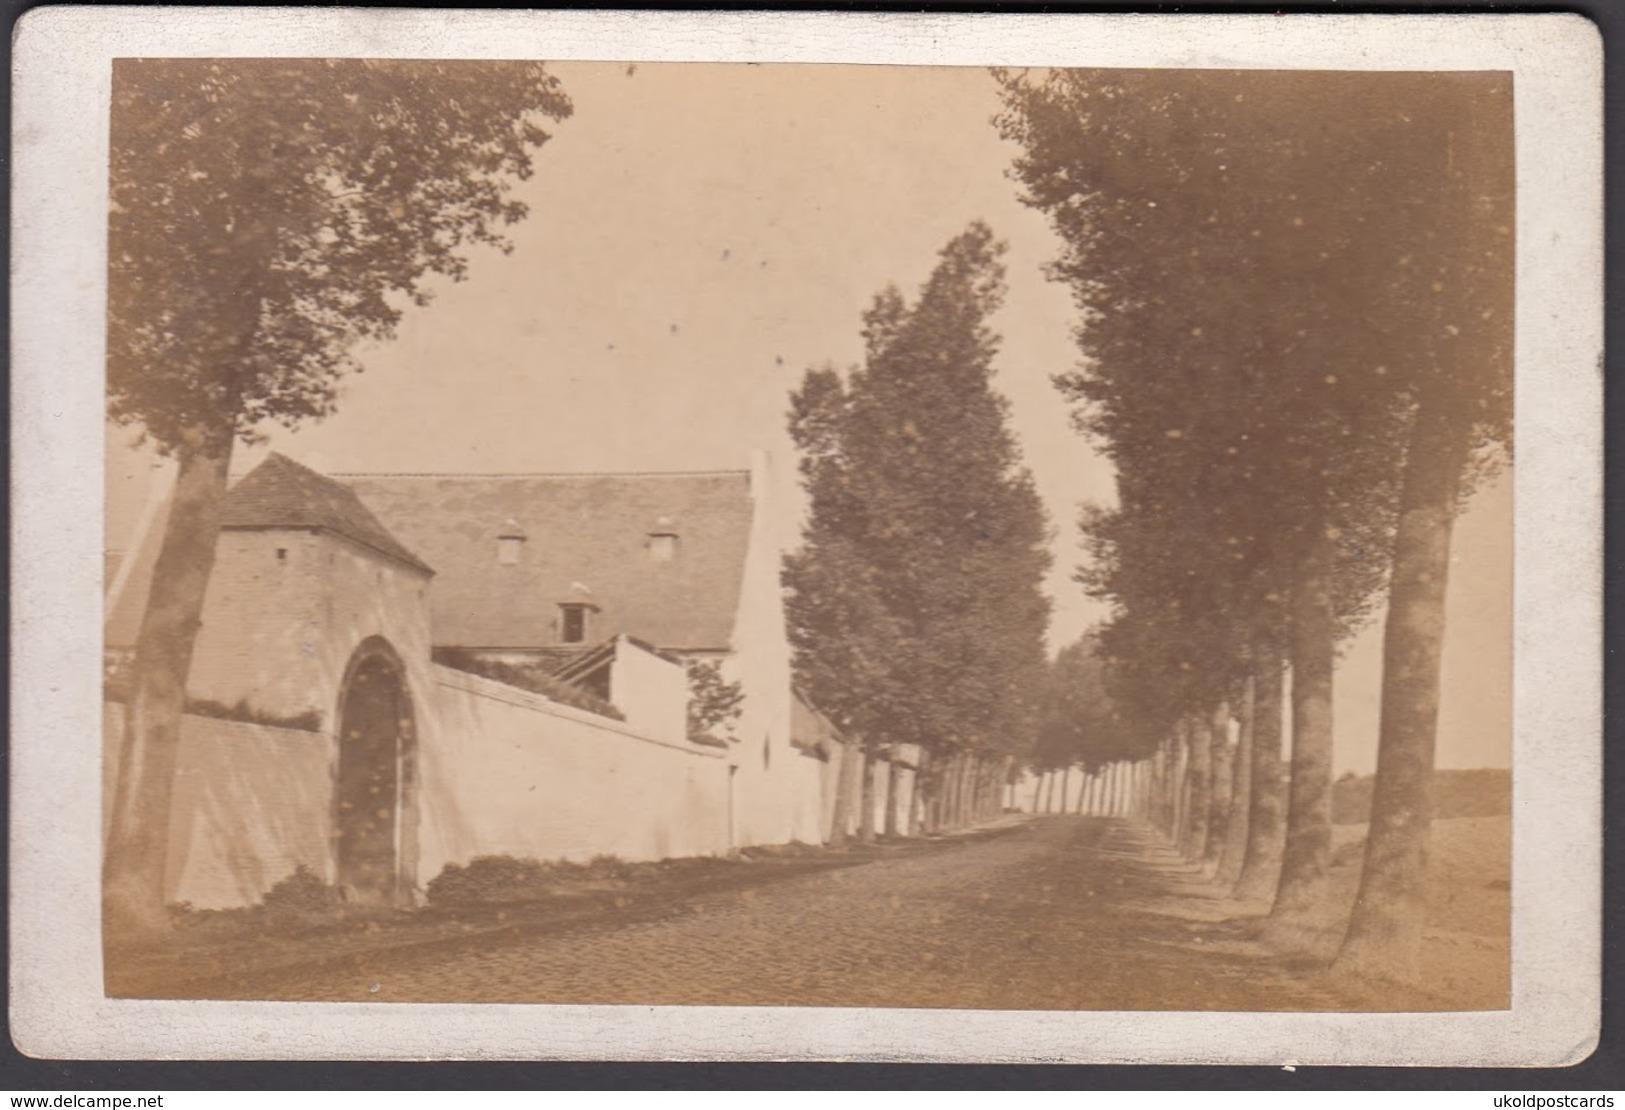 BELGIQUE -  Waterloo, La Haie-Sainte, C 1870 - Cabinet Photograph - Old (before 1900)